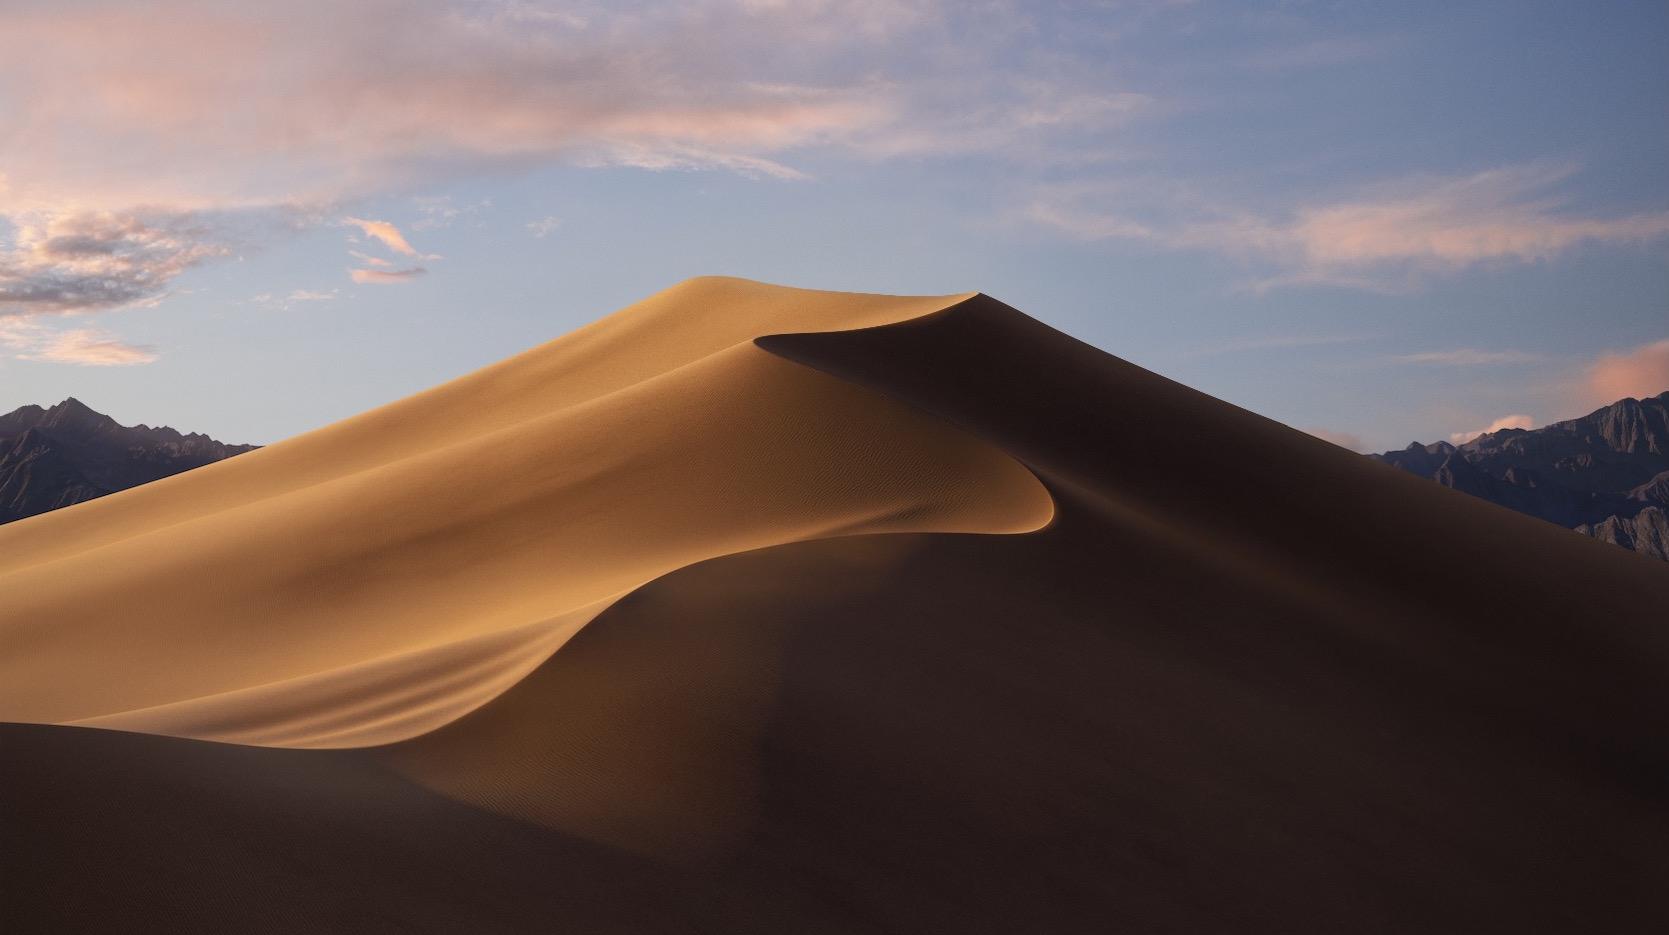 Fall Themed Wallpaper Desktop Grab The 2 Default Macos Mojave Wallpapers